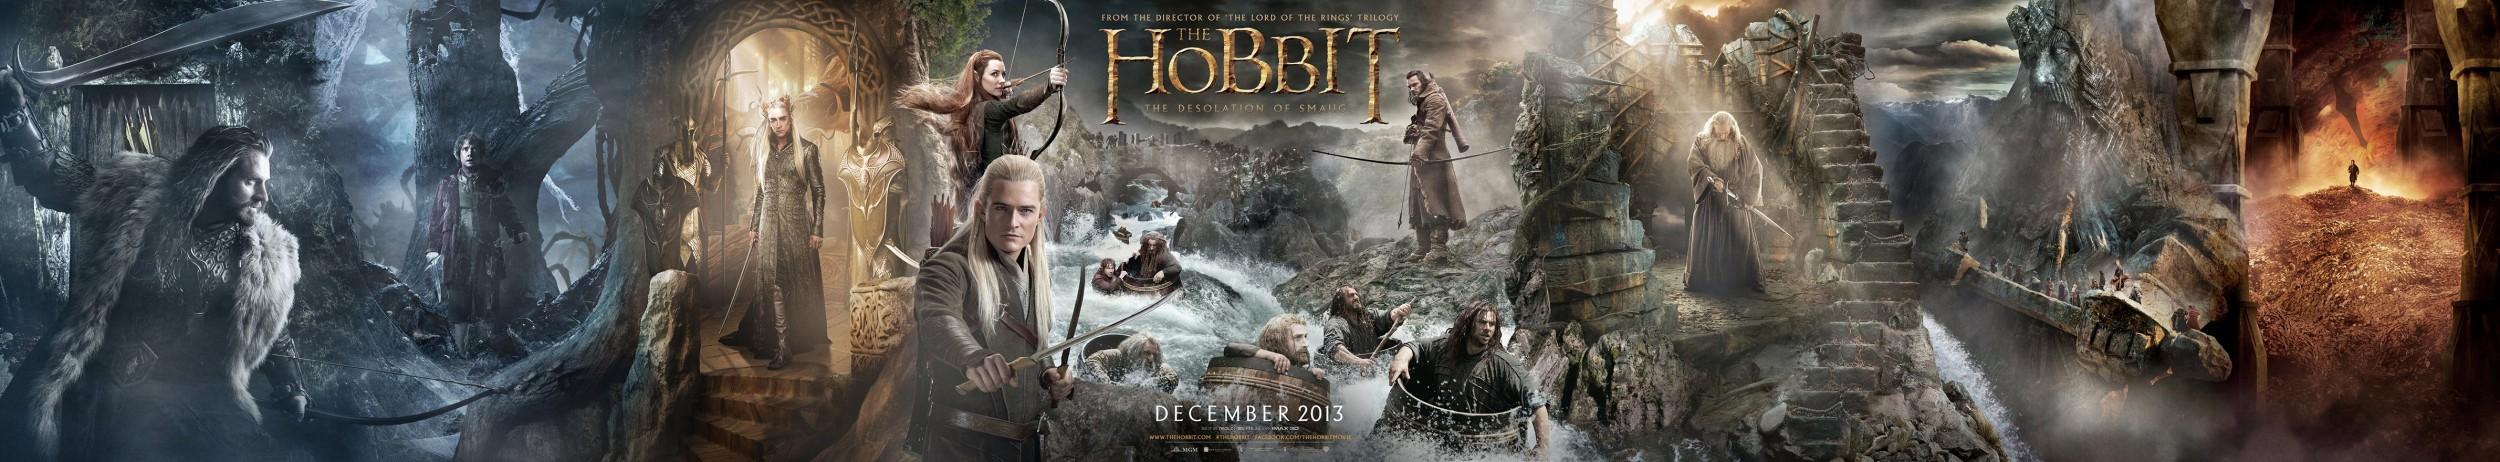 hobbit-desolation-de-smaug-grande-banniere